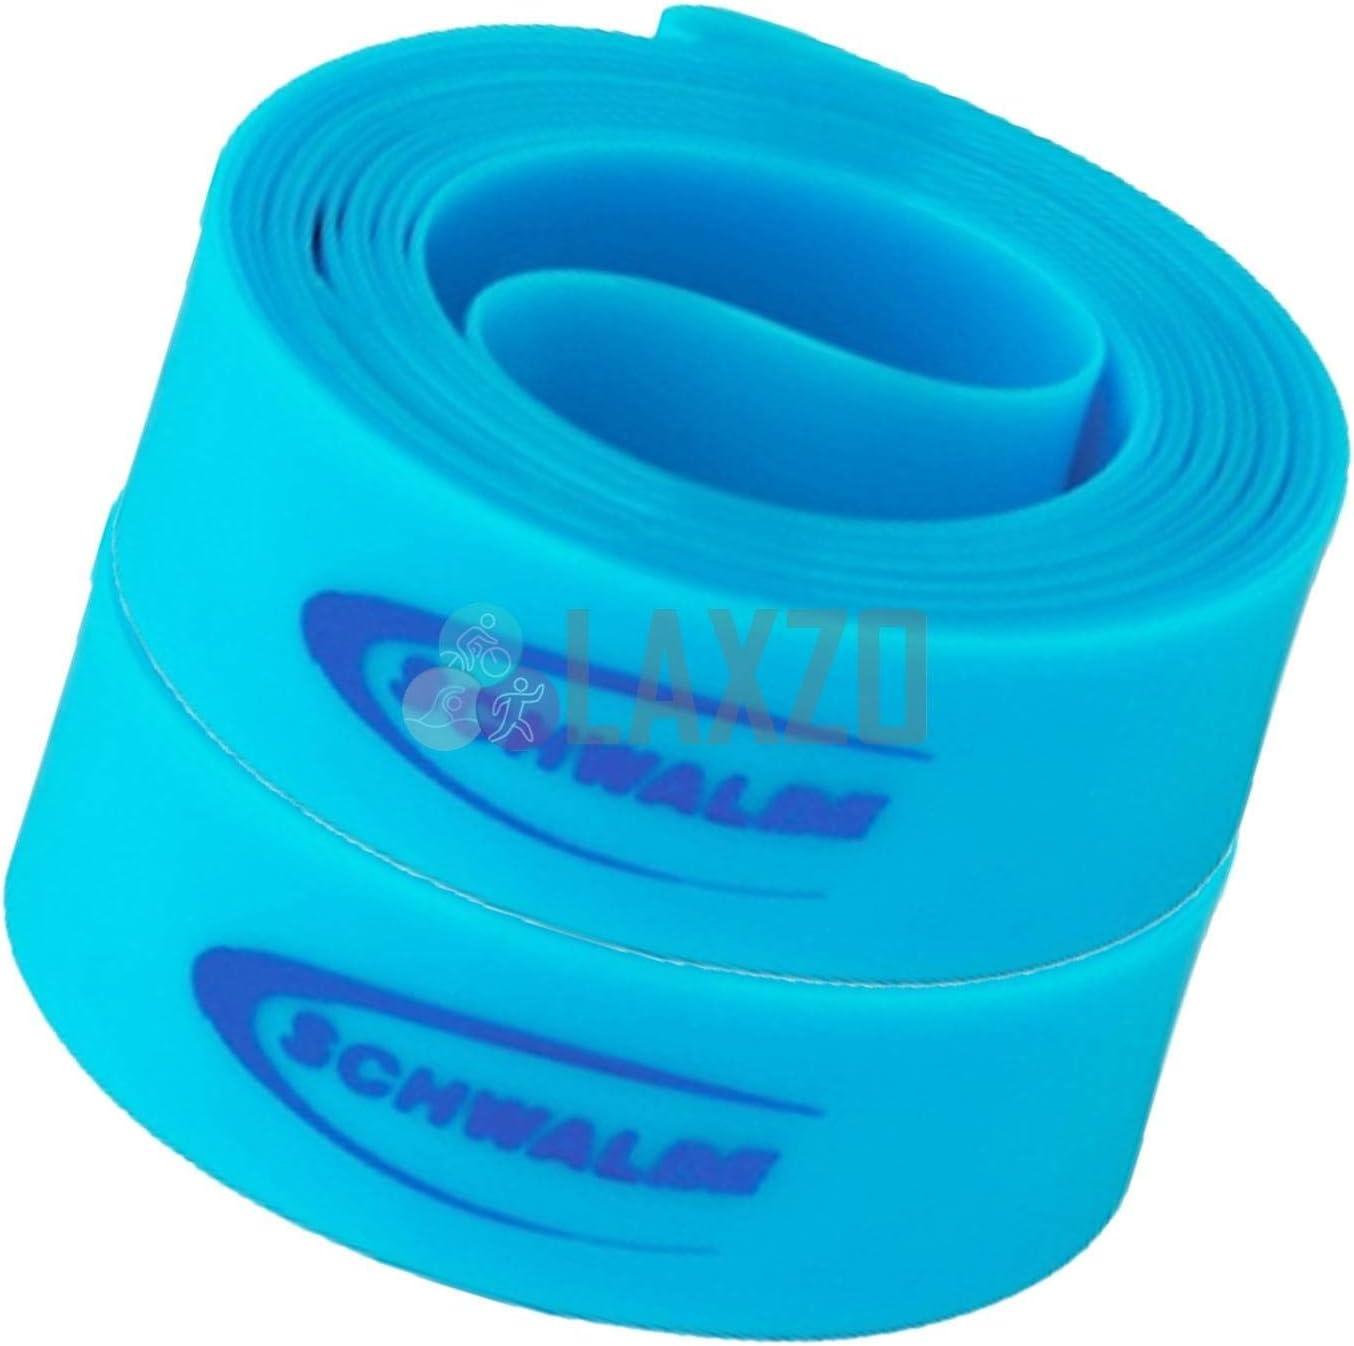 "Tape puncture bike bicycle MTB 28/"" Schwalbe 20-622 Blue b246"